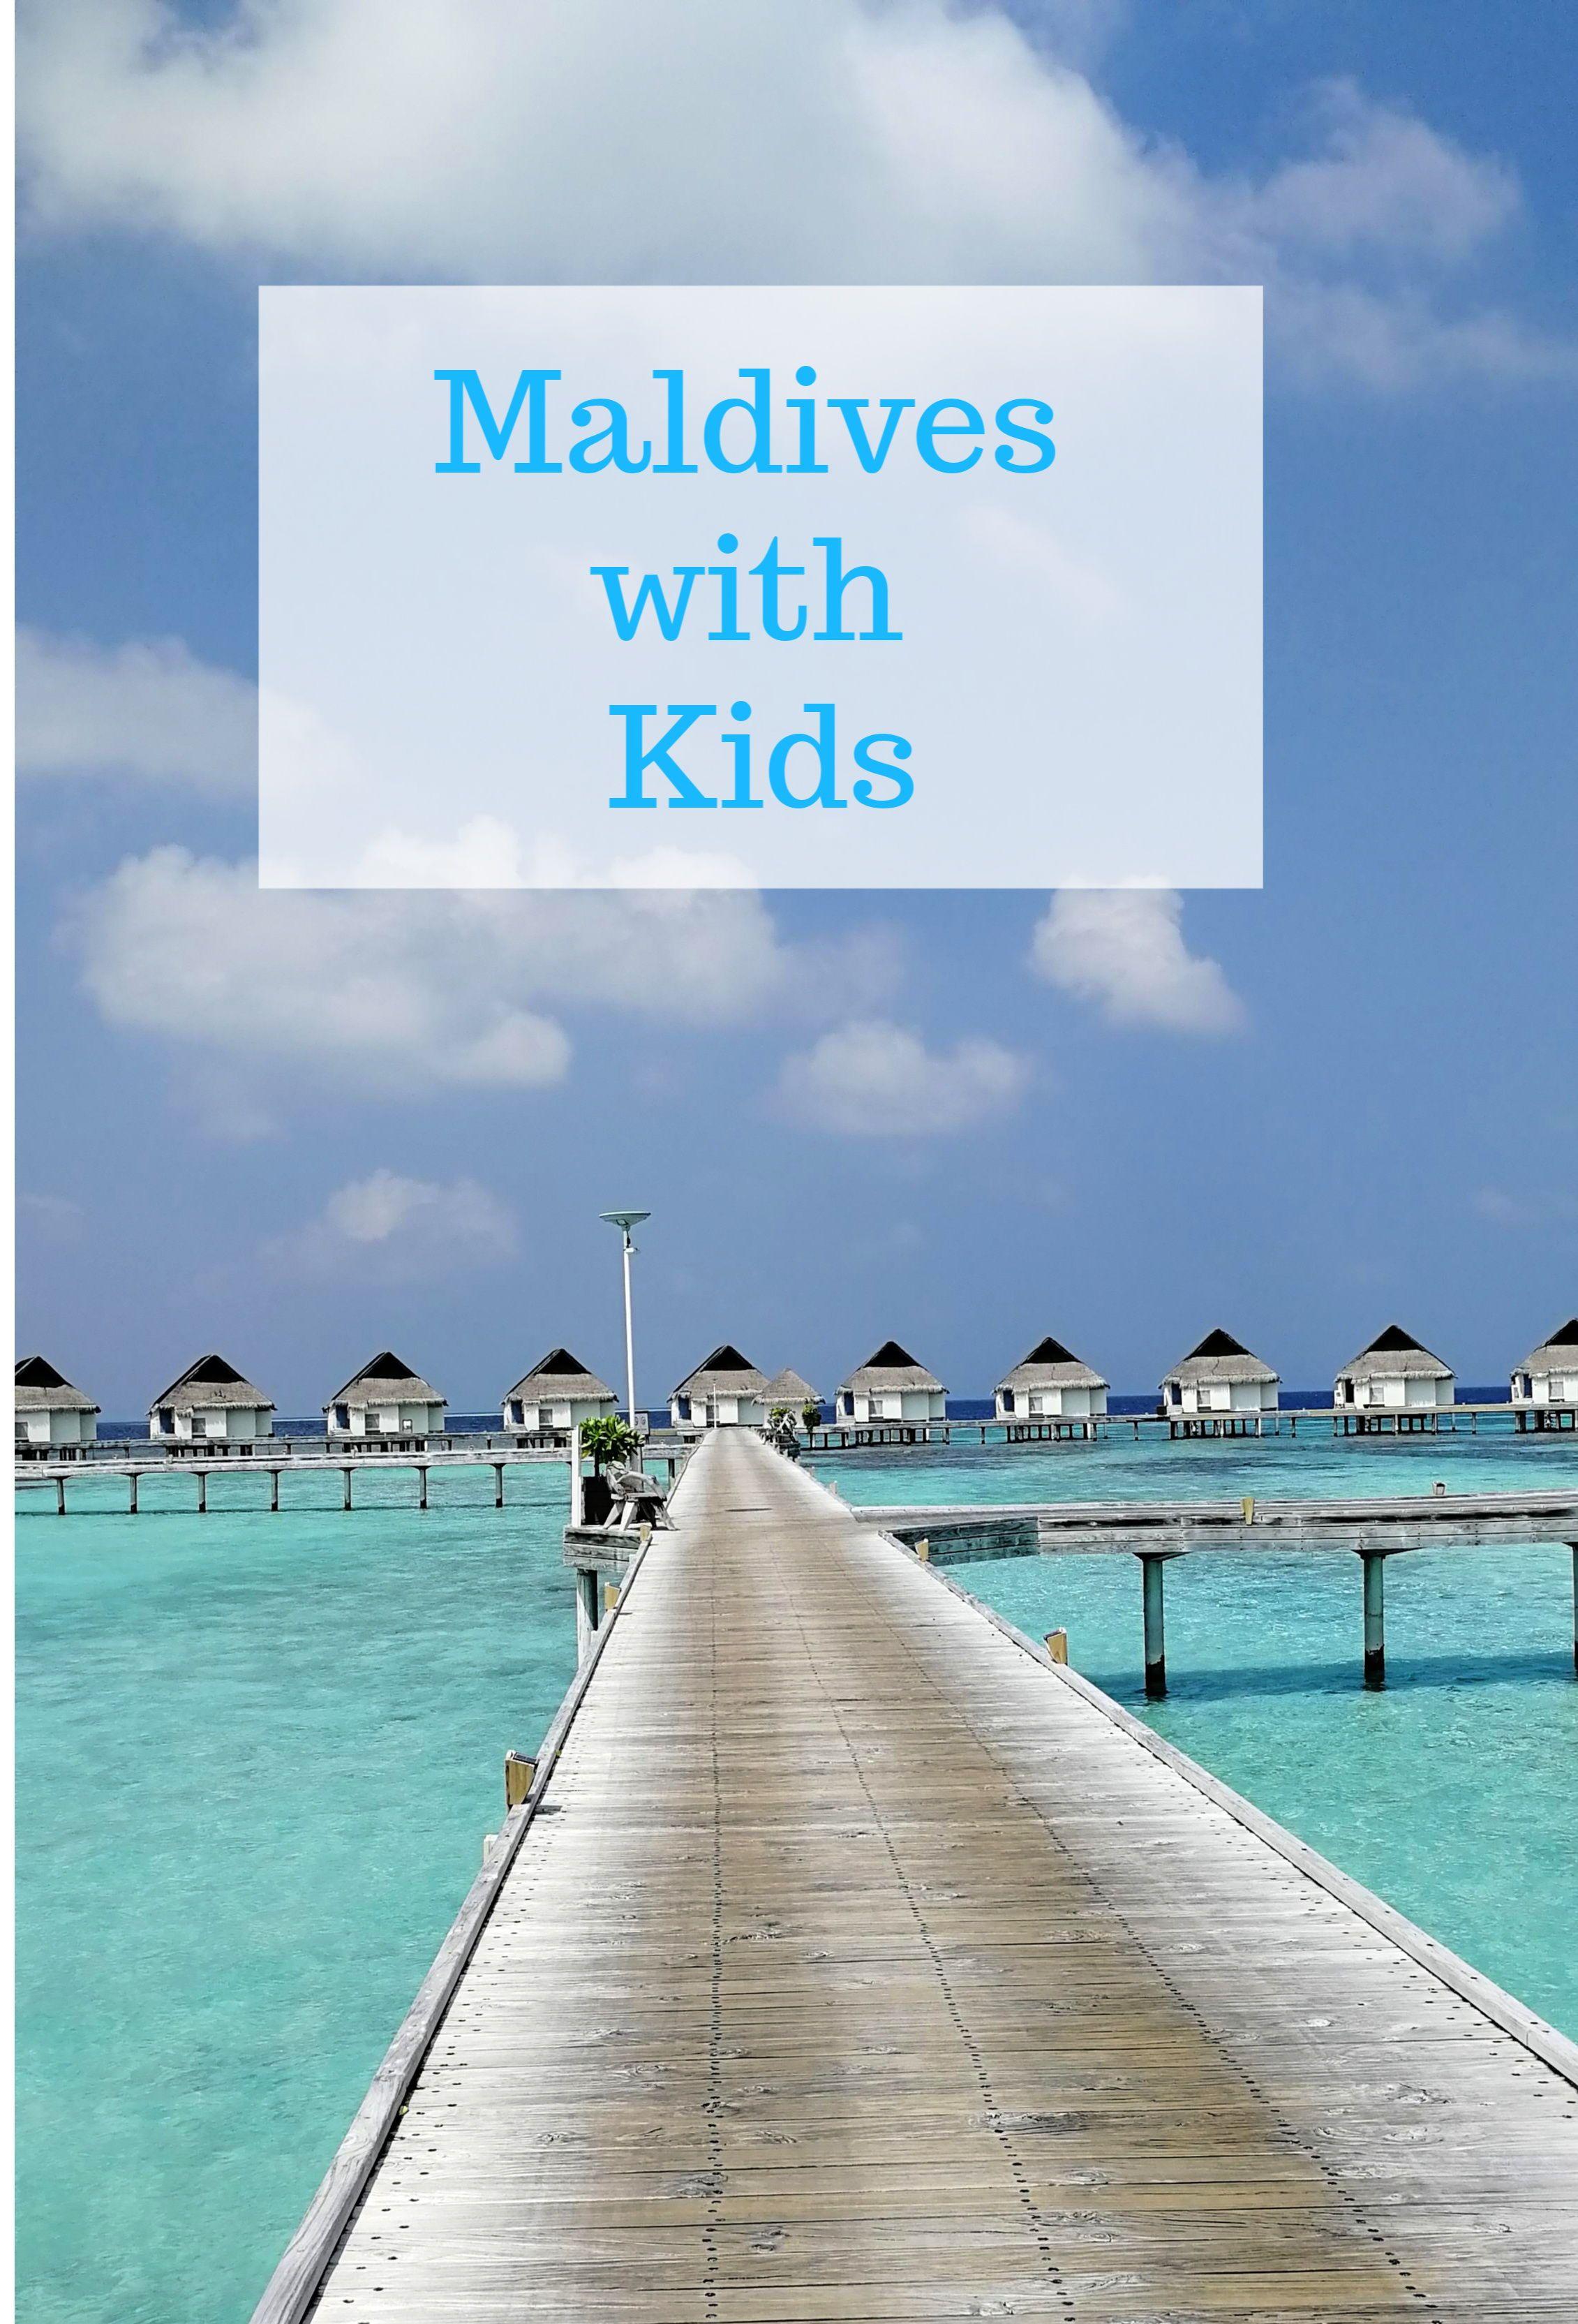 MALDIVES WITH KIDS – Maldives family holiday